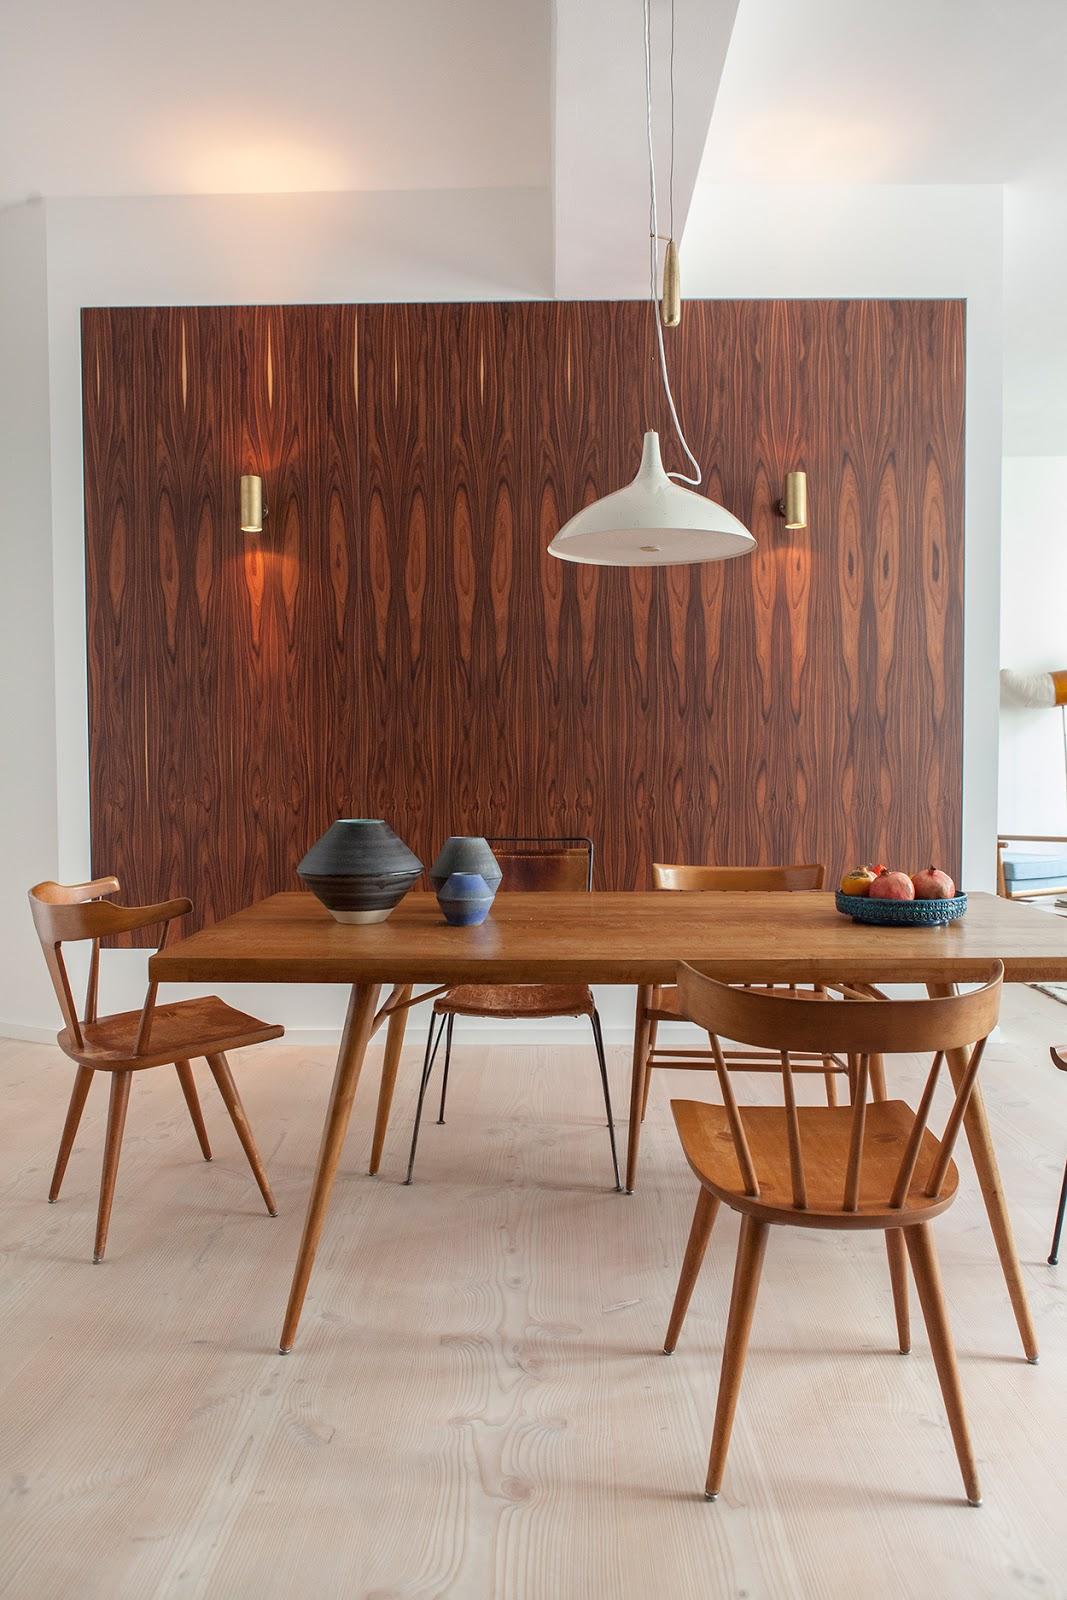 wood paneling in designer loft in berlin, mid century modern furniture,  pottery collection, interior design